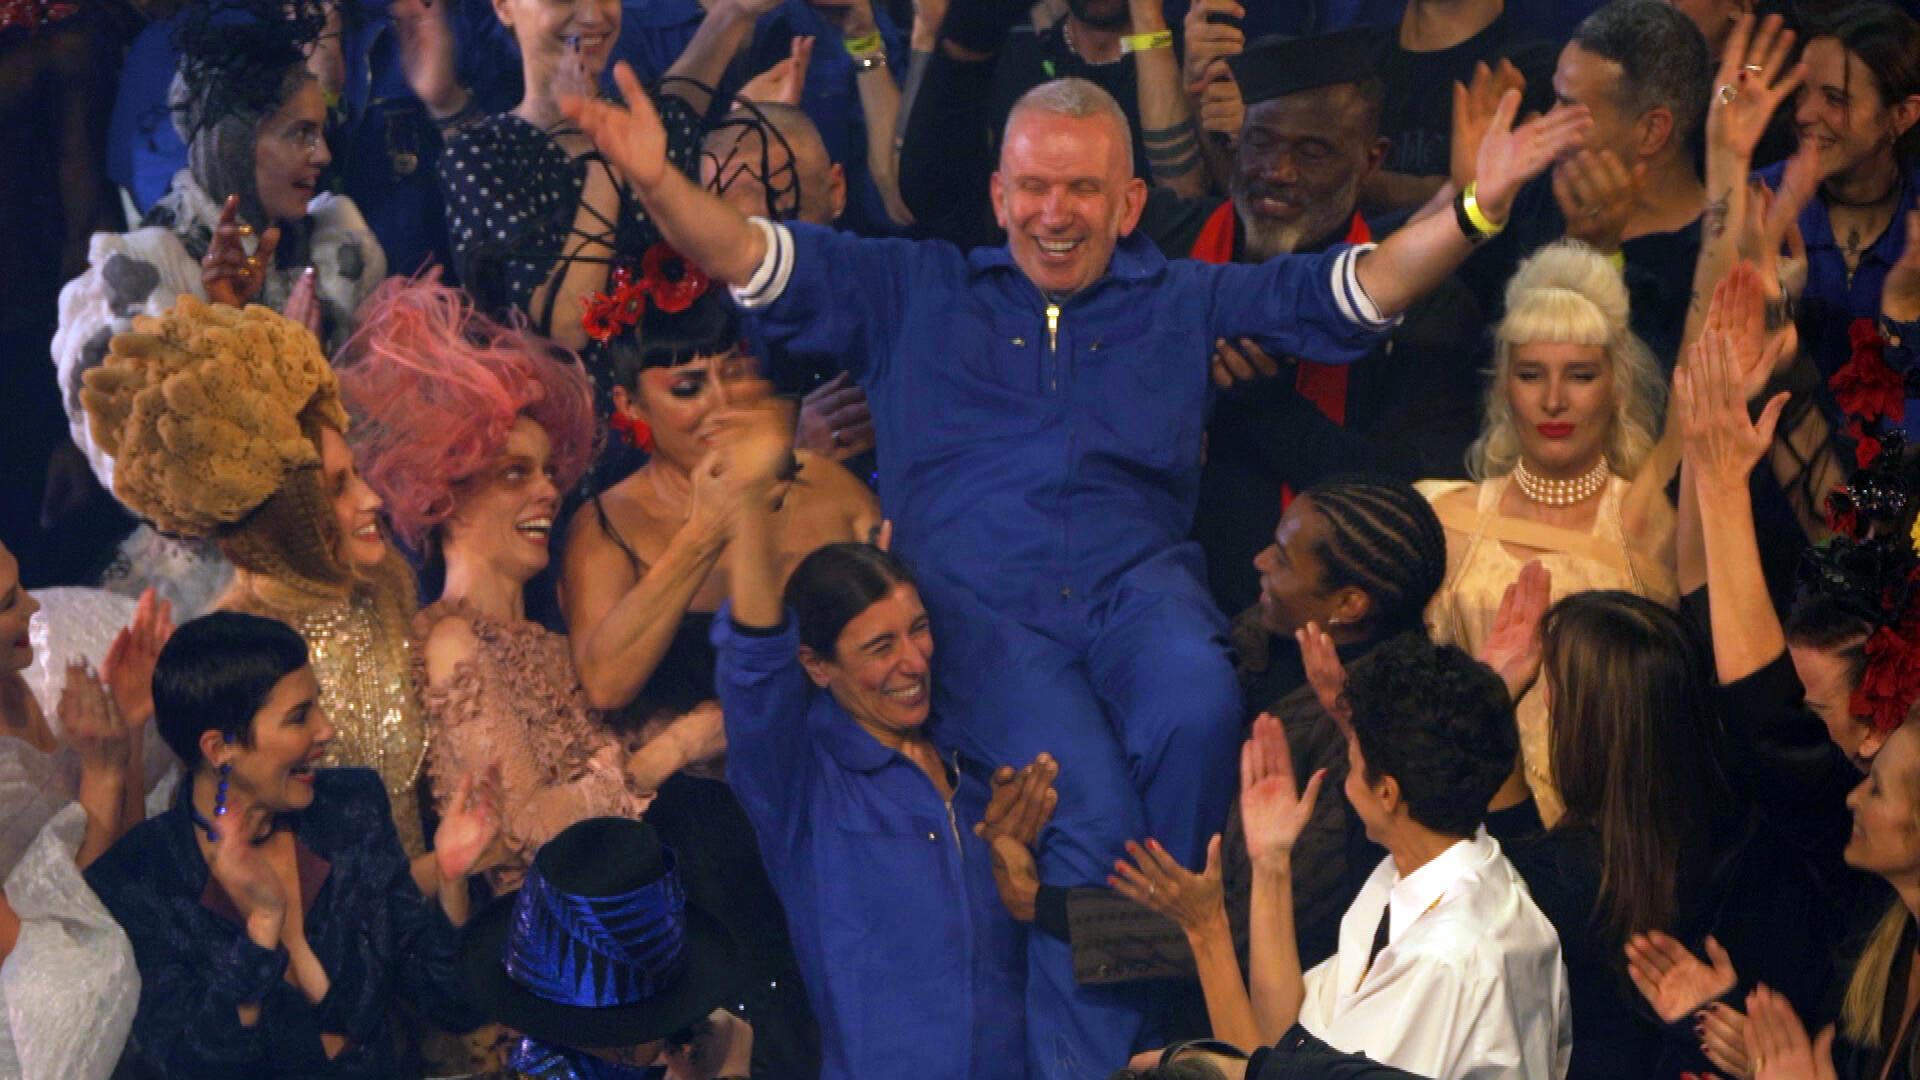 Jean-Paul Gaultier's final catwalk show.